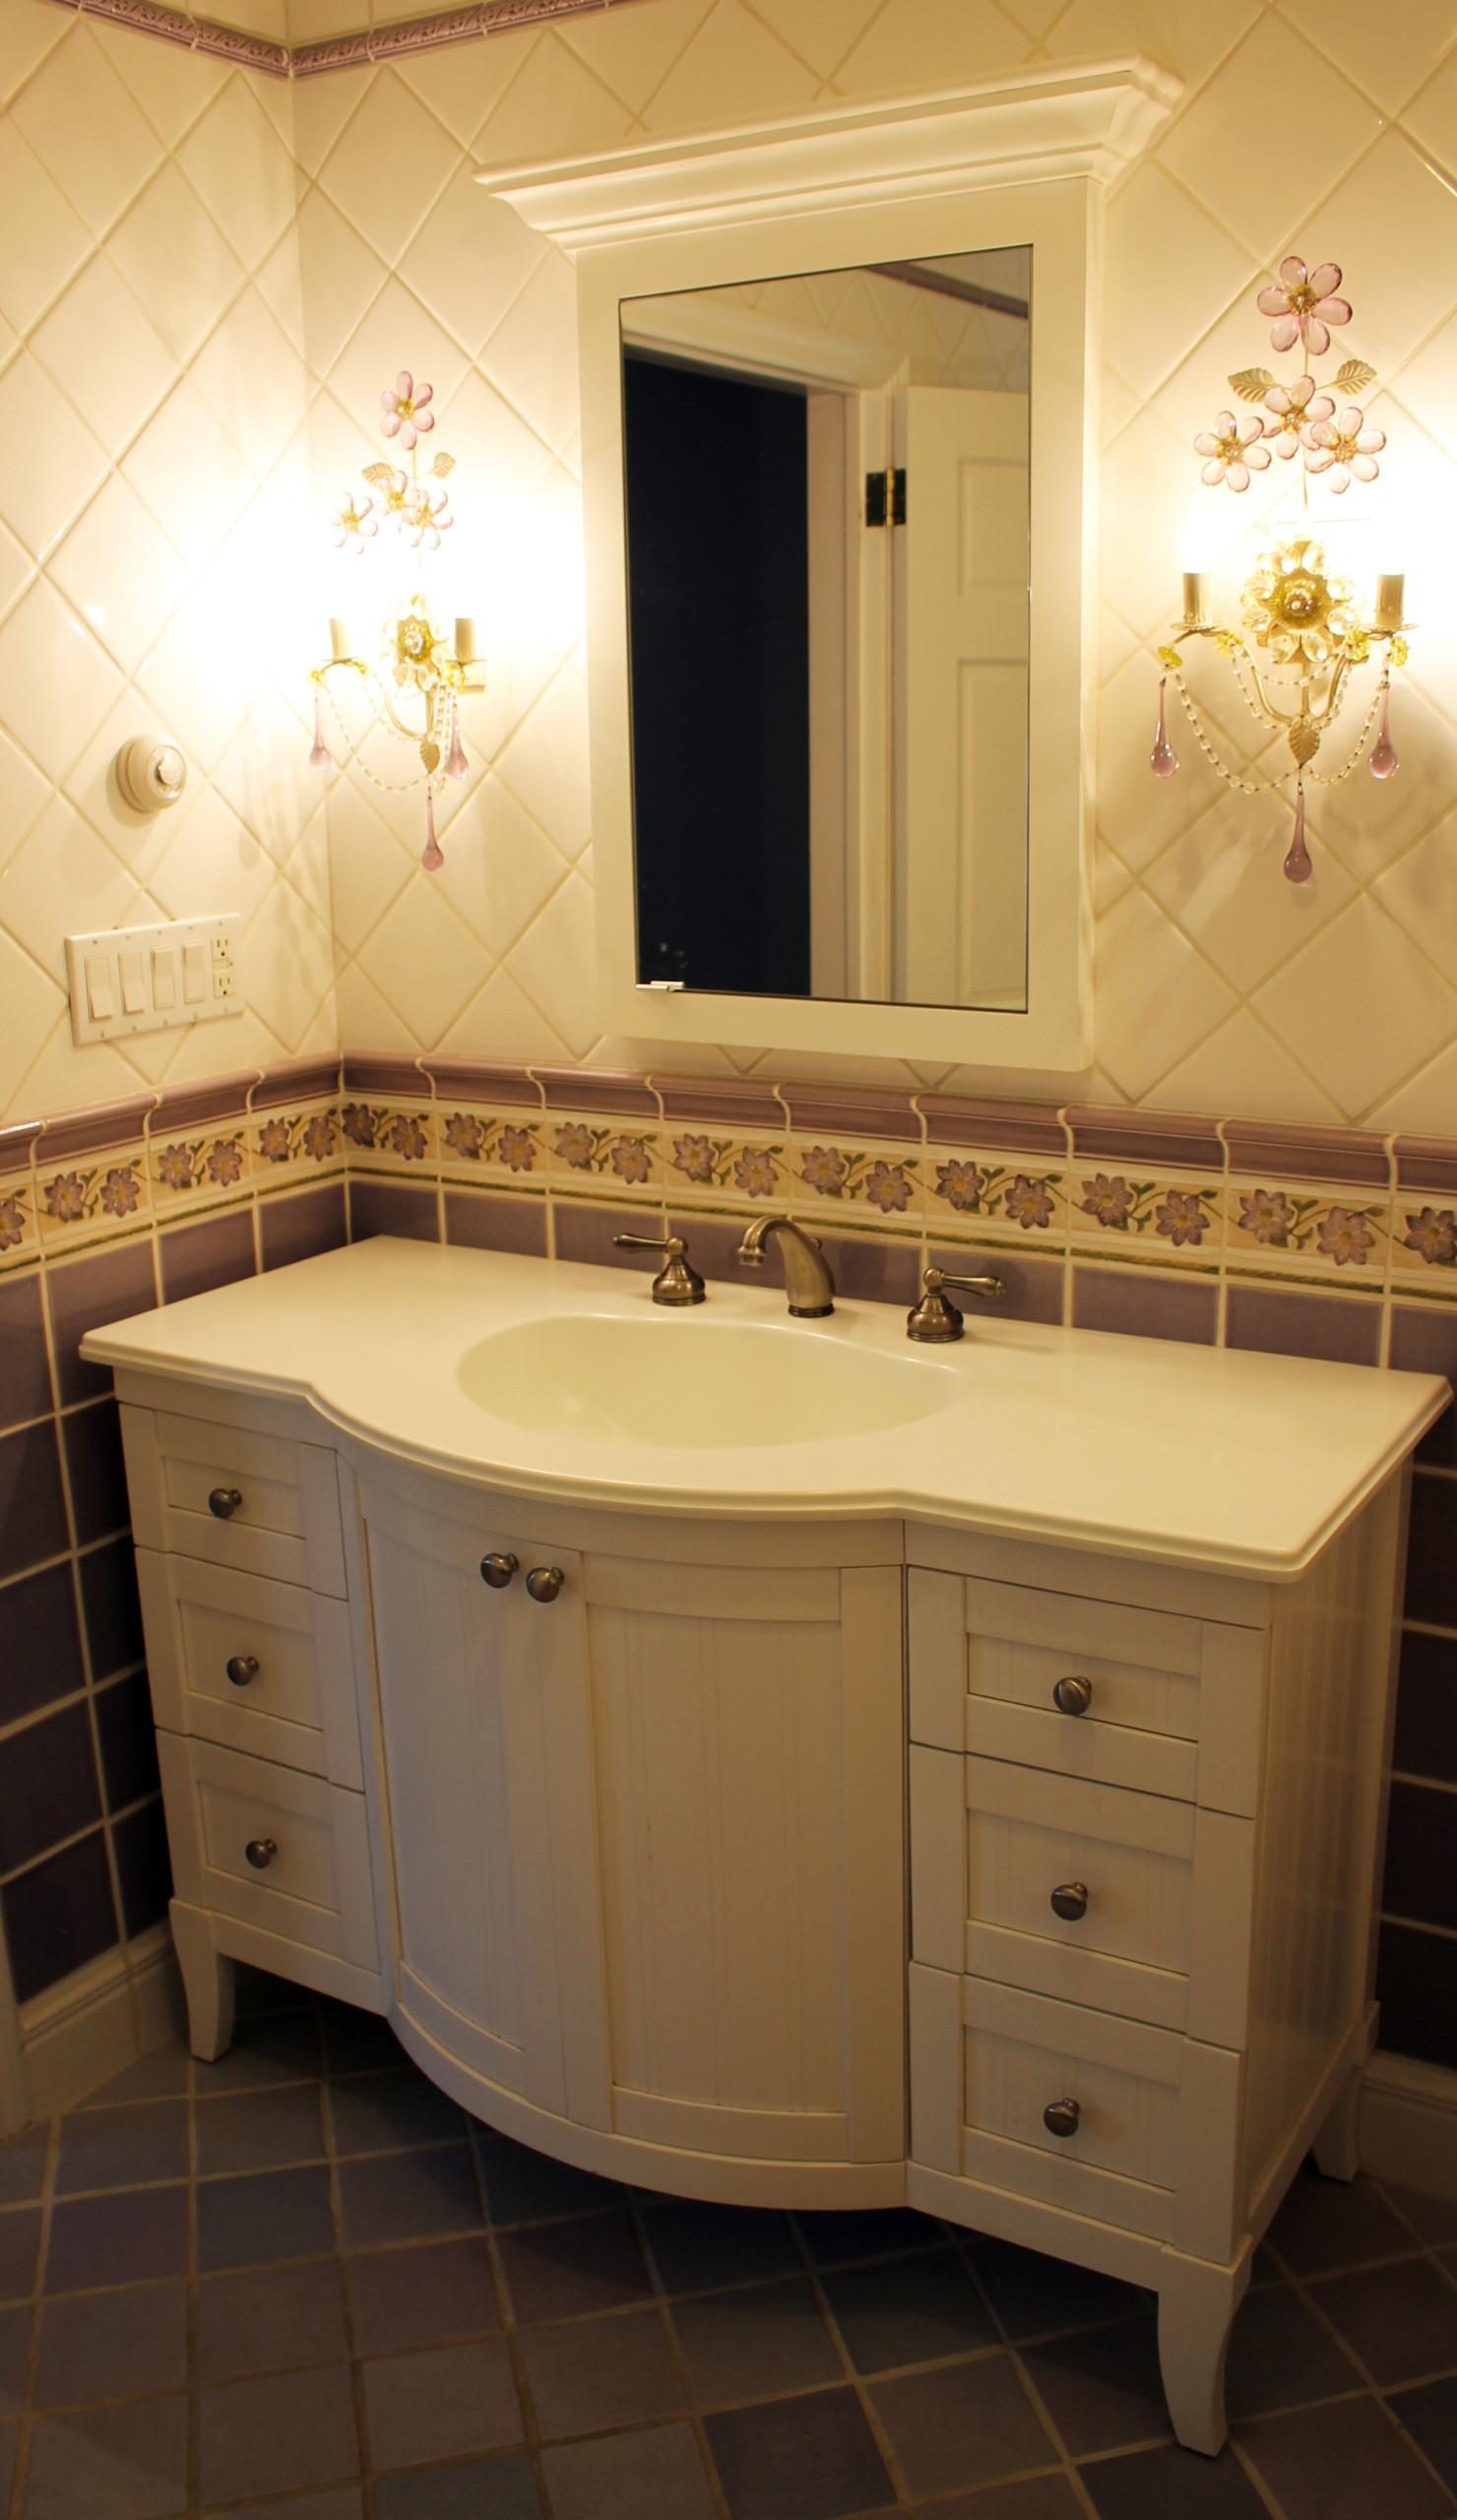 Traditional custom vanity Lawrence, NY Home